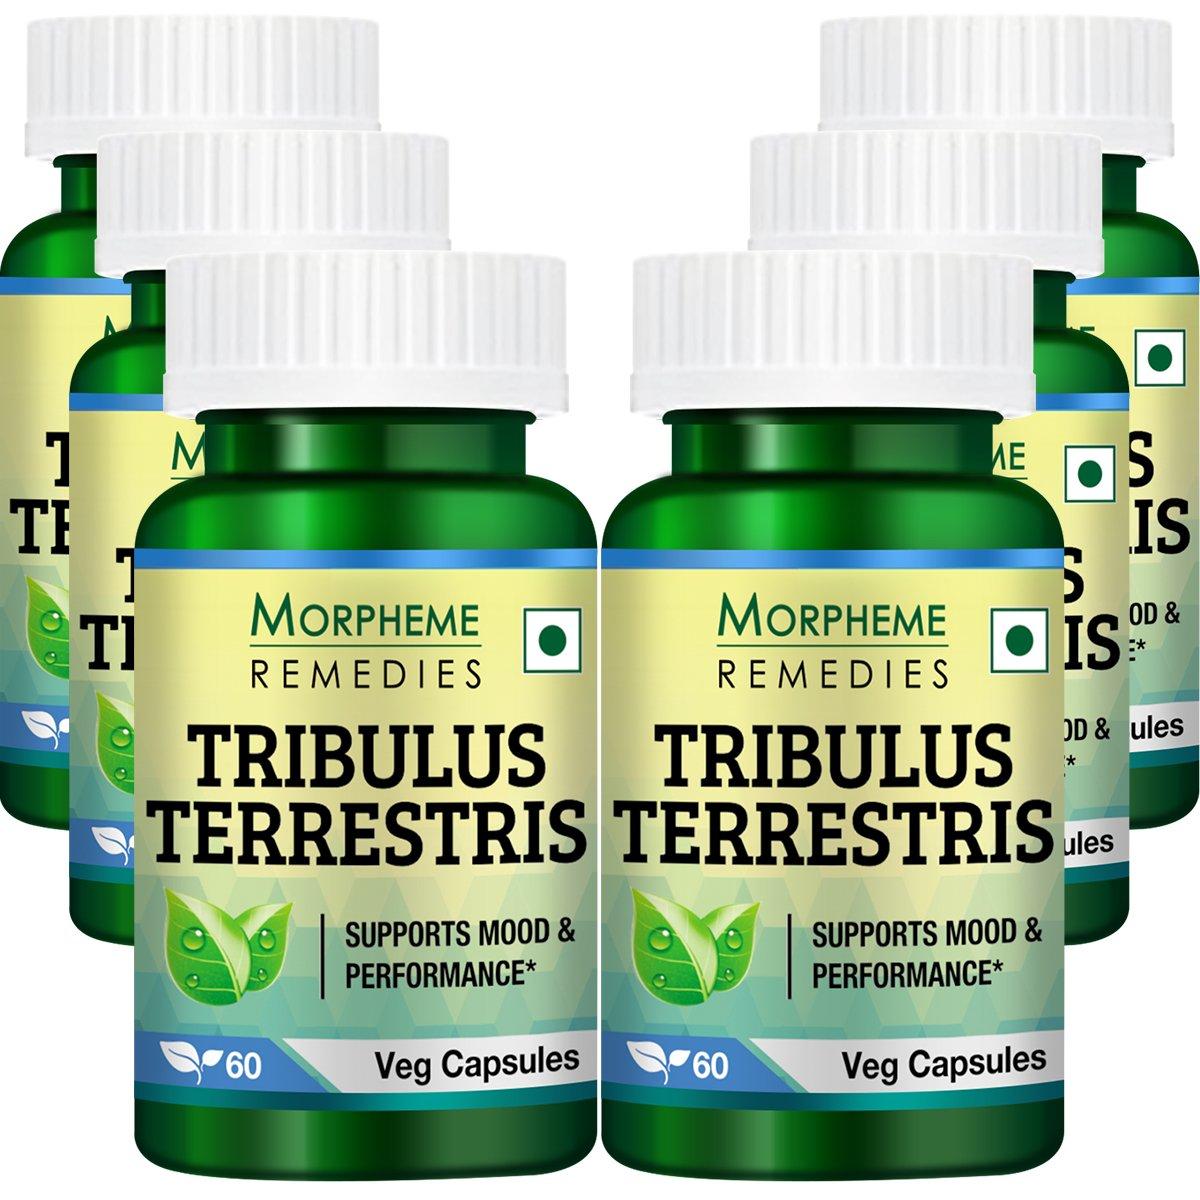 Morpheme Tribulus Terrestris Capsules - 500mg Extract - 60 Veg Capsules - 6 Combo Pack